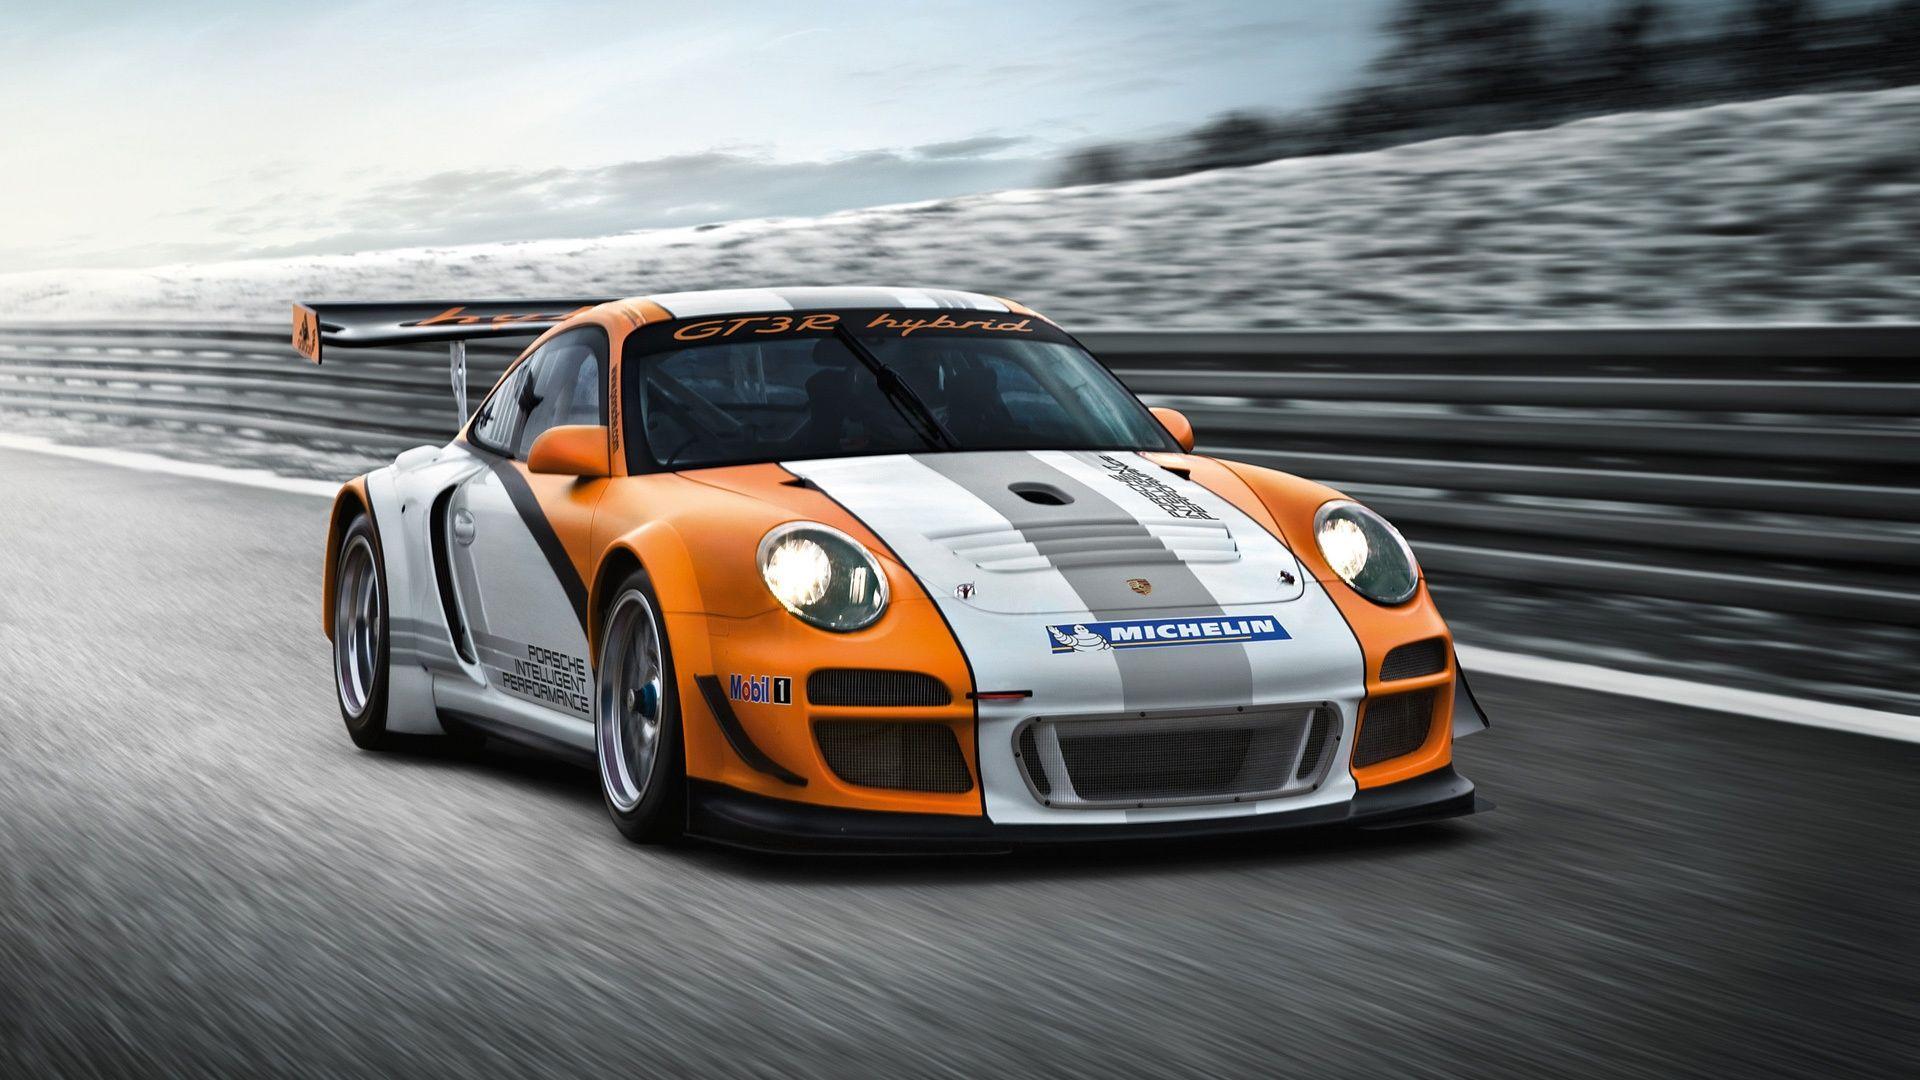 Picture 2017 Porsche Gt3 Rybrid Hd Wallpapers 1080p Cars Cars Images Findhdwallpaper Com Porsche 911 Gt3 Porsche Gt Porsche 911